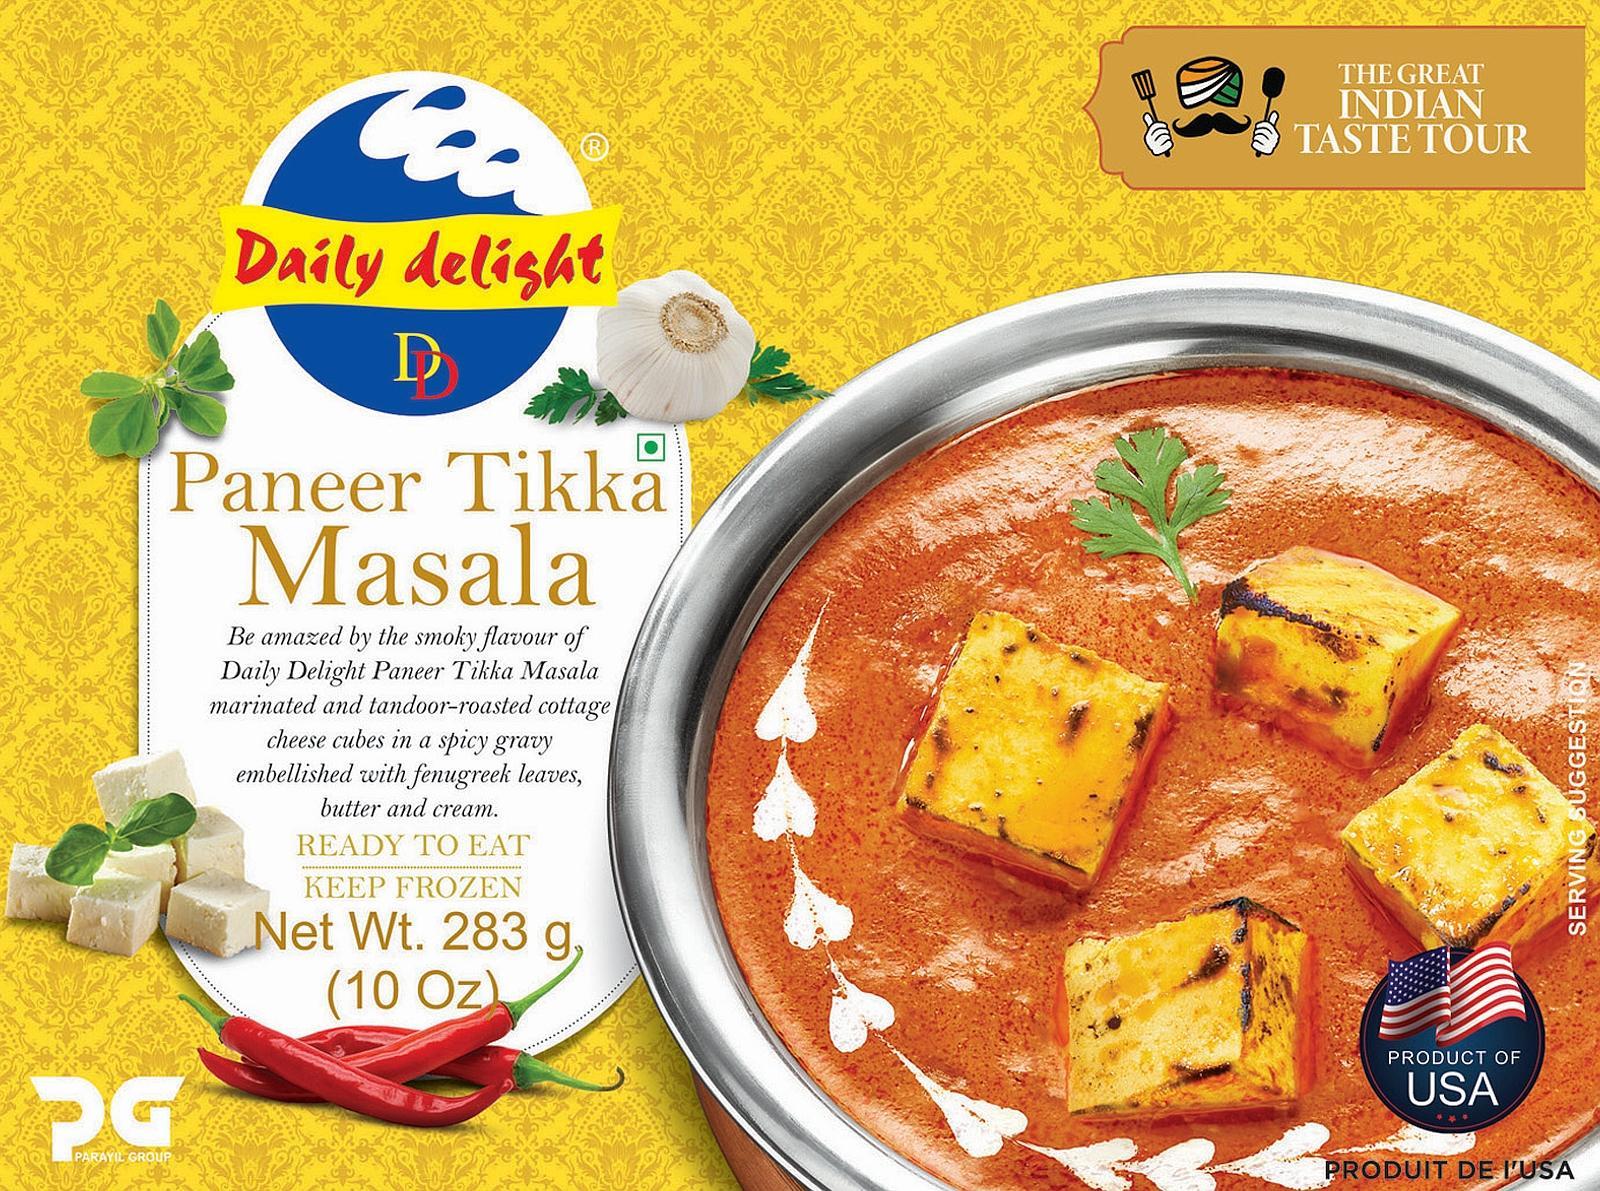 Daily Delight Paneer Tikka Masala